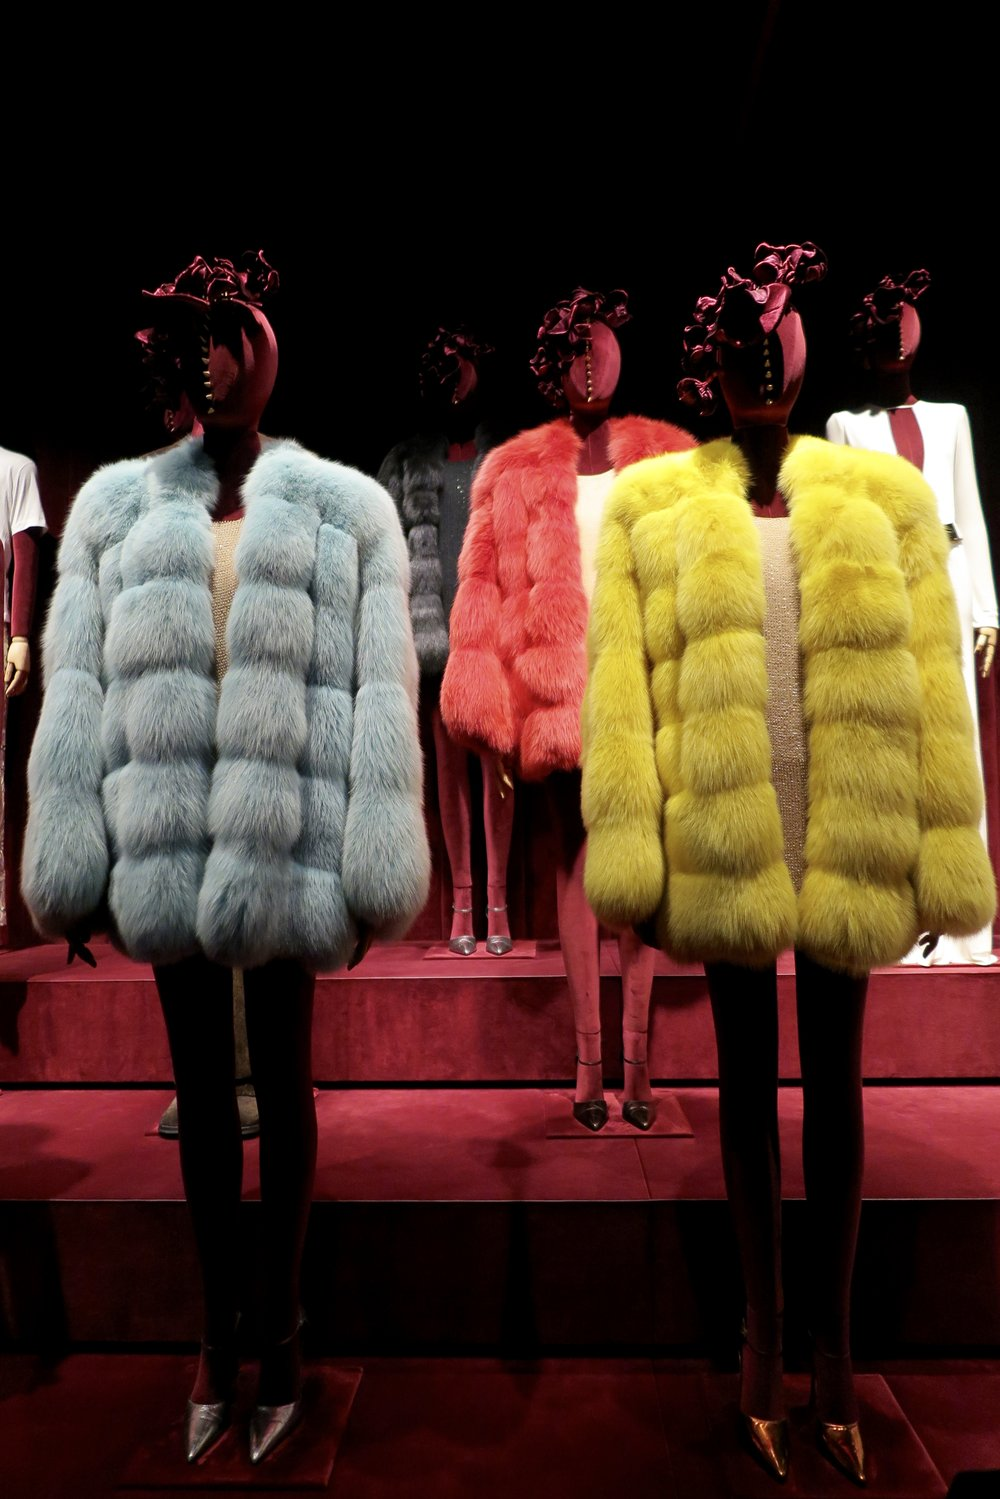 Samantha McNeil Blog - Gucci Museum, Tom Ford